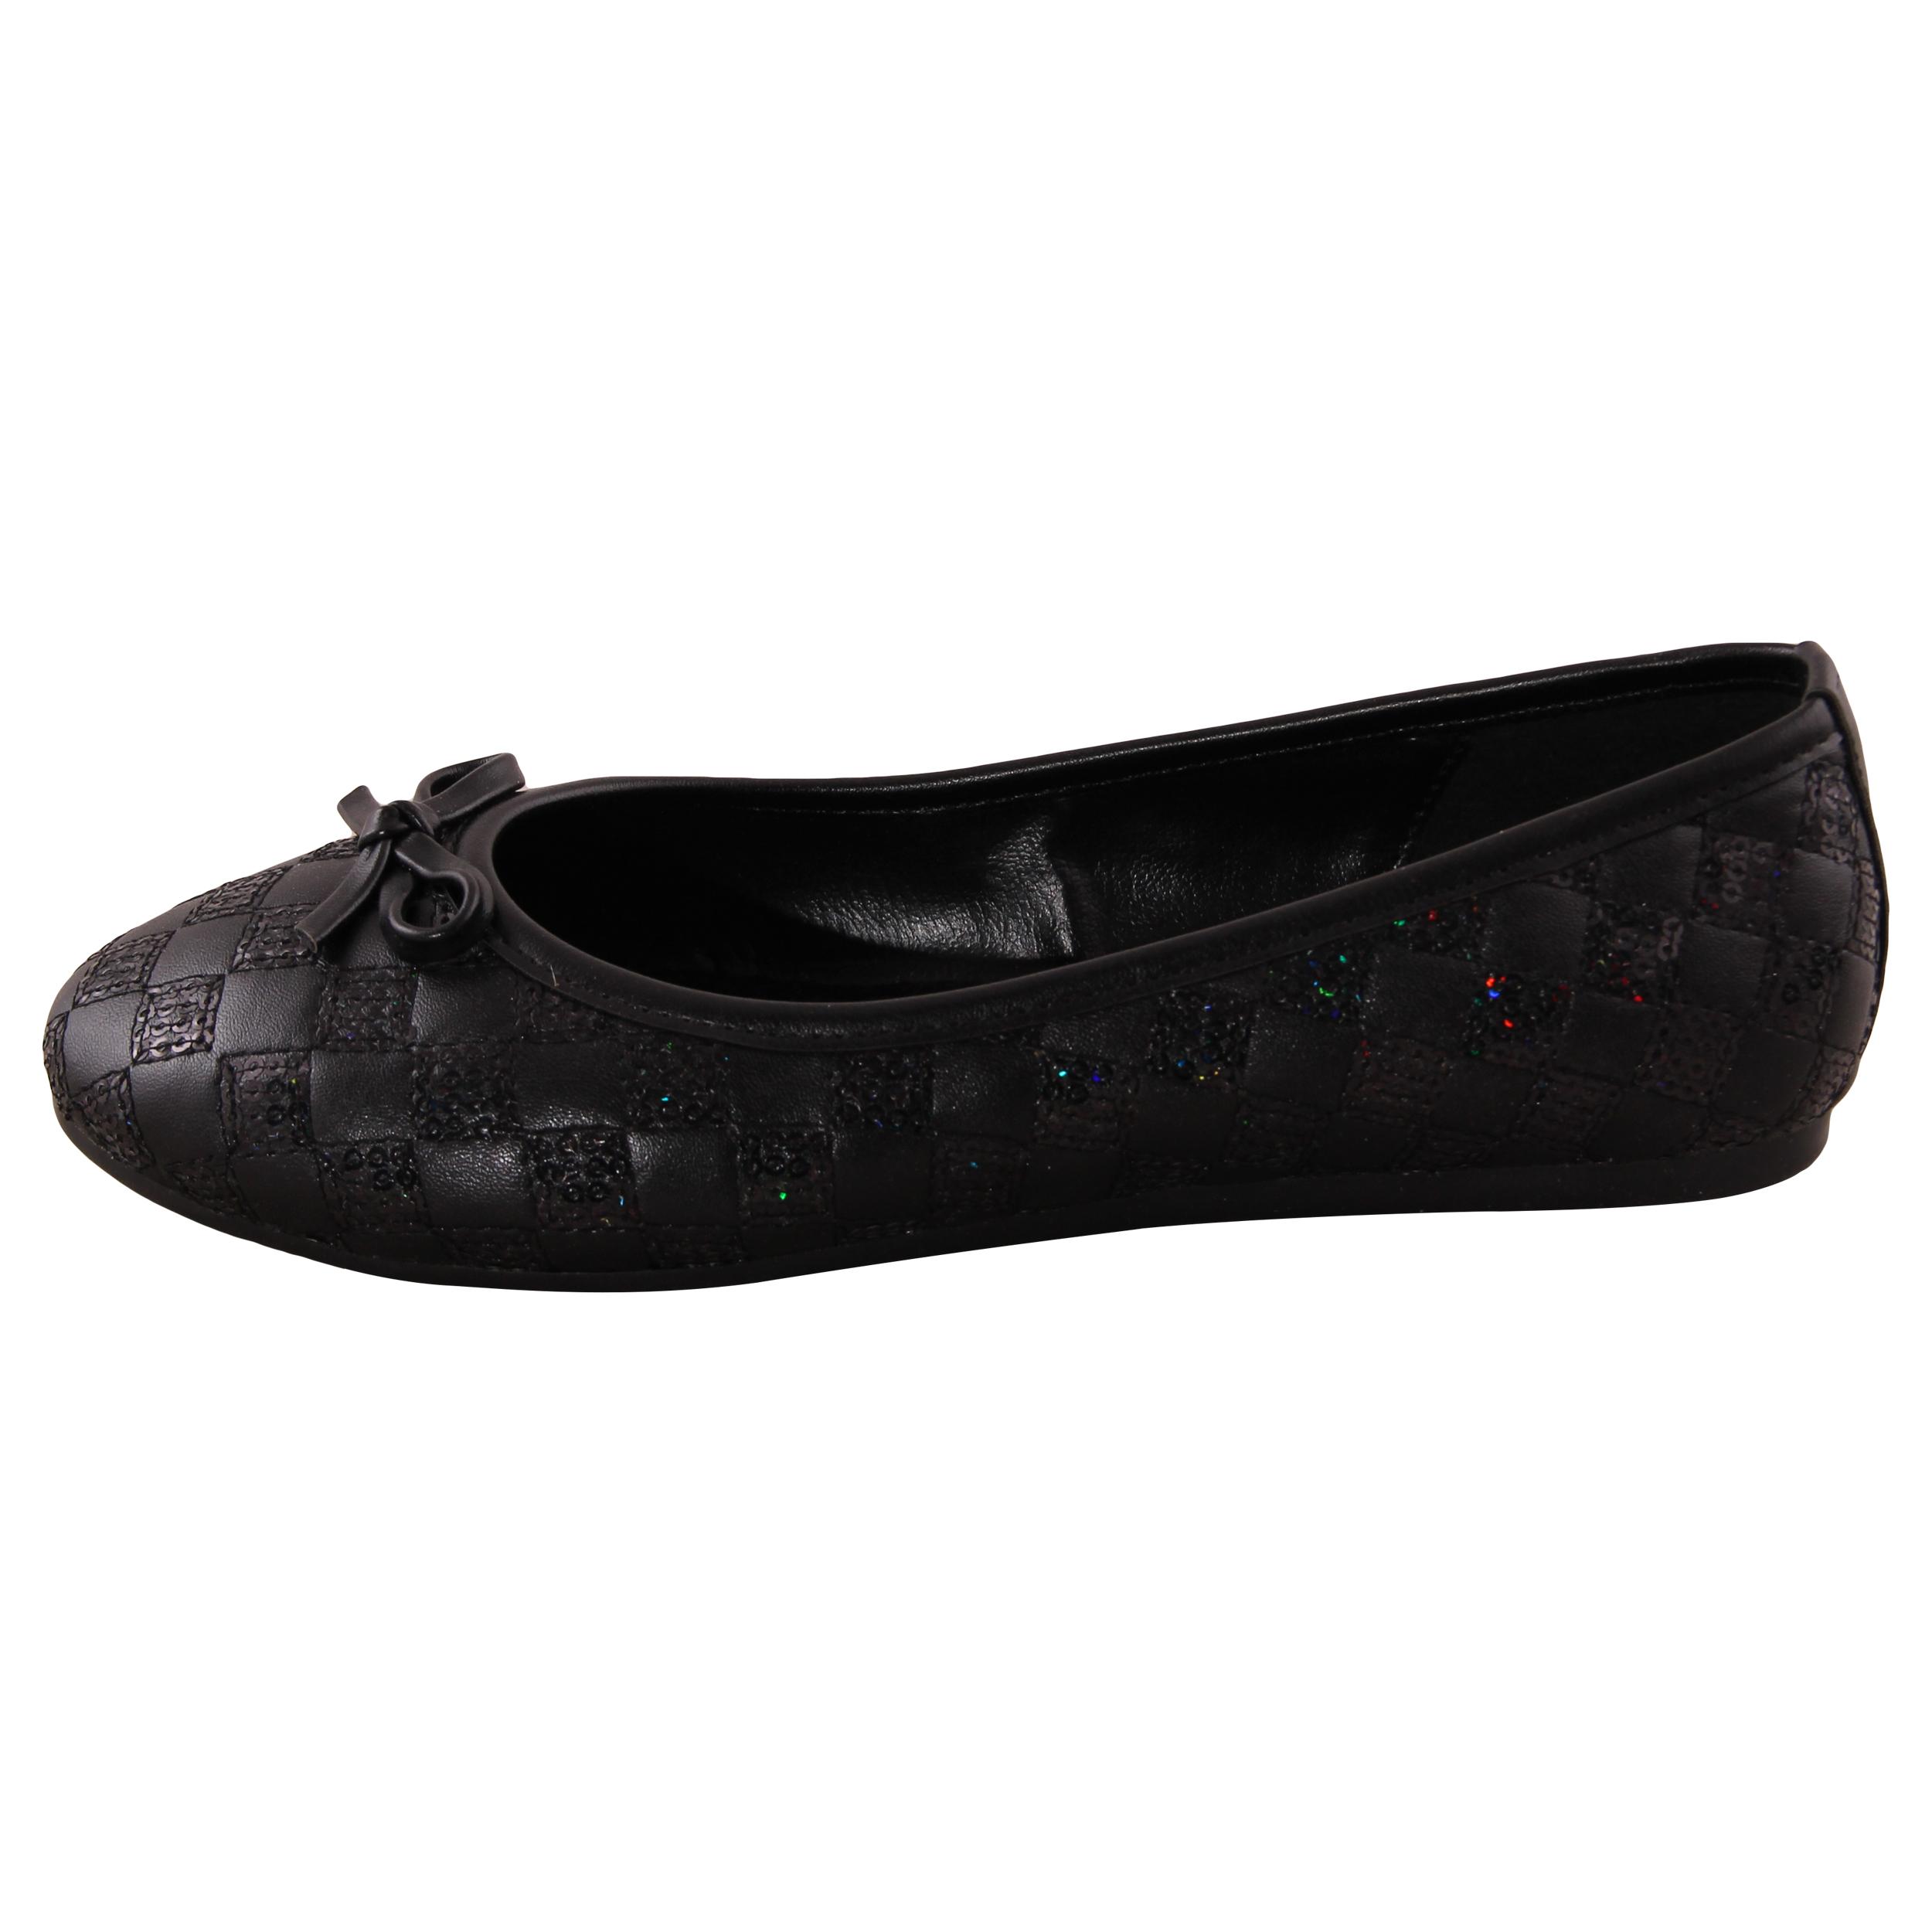 کفش زنانه کد 1-39938